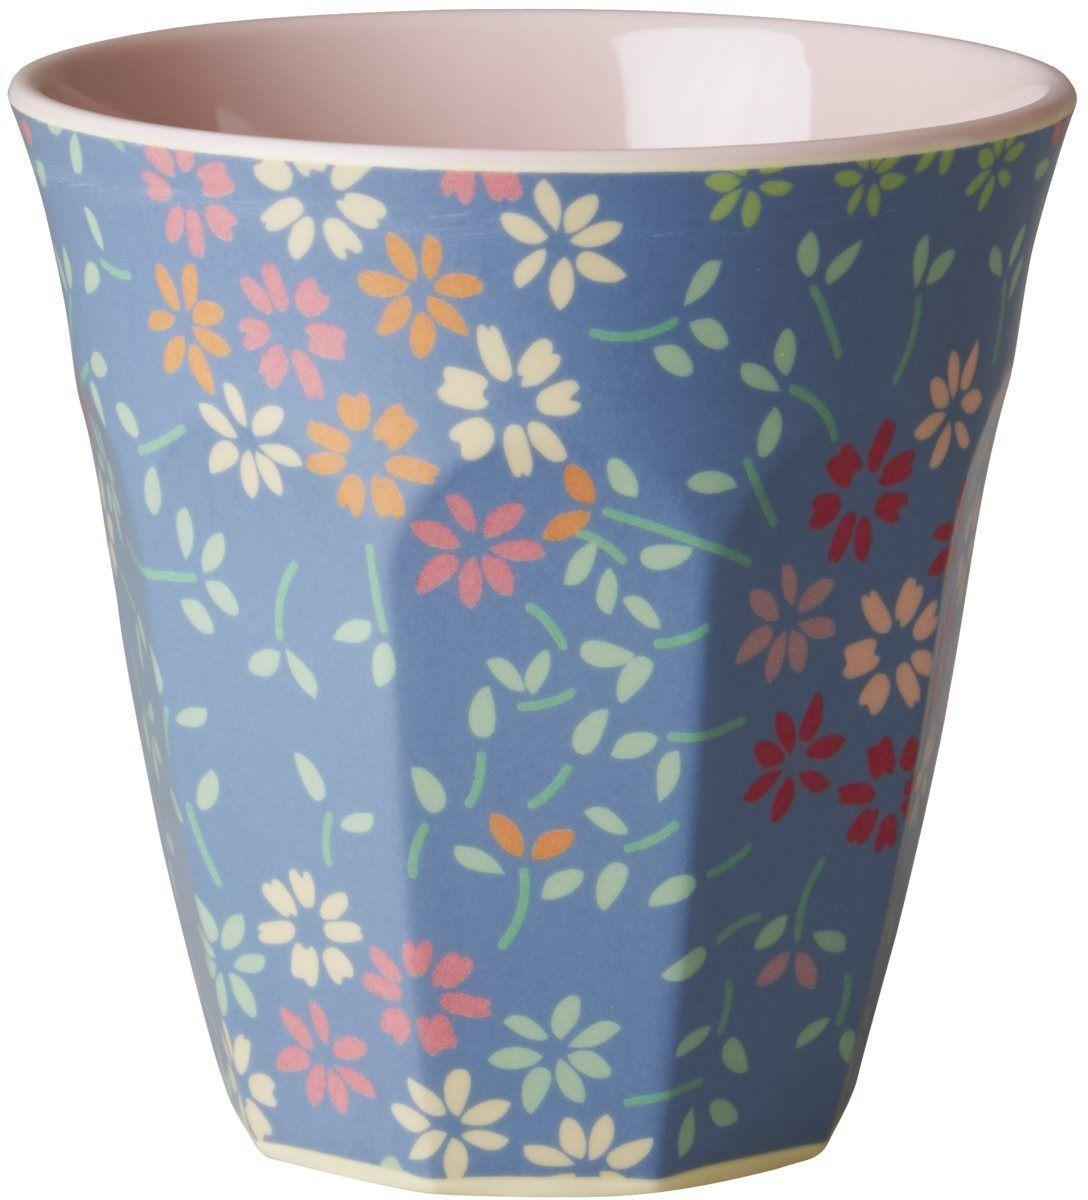 RICE Melamine Tall Latte Two Tone Cup Marrakesh Print Blue